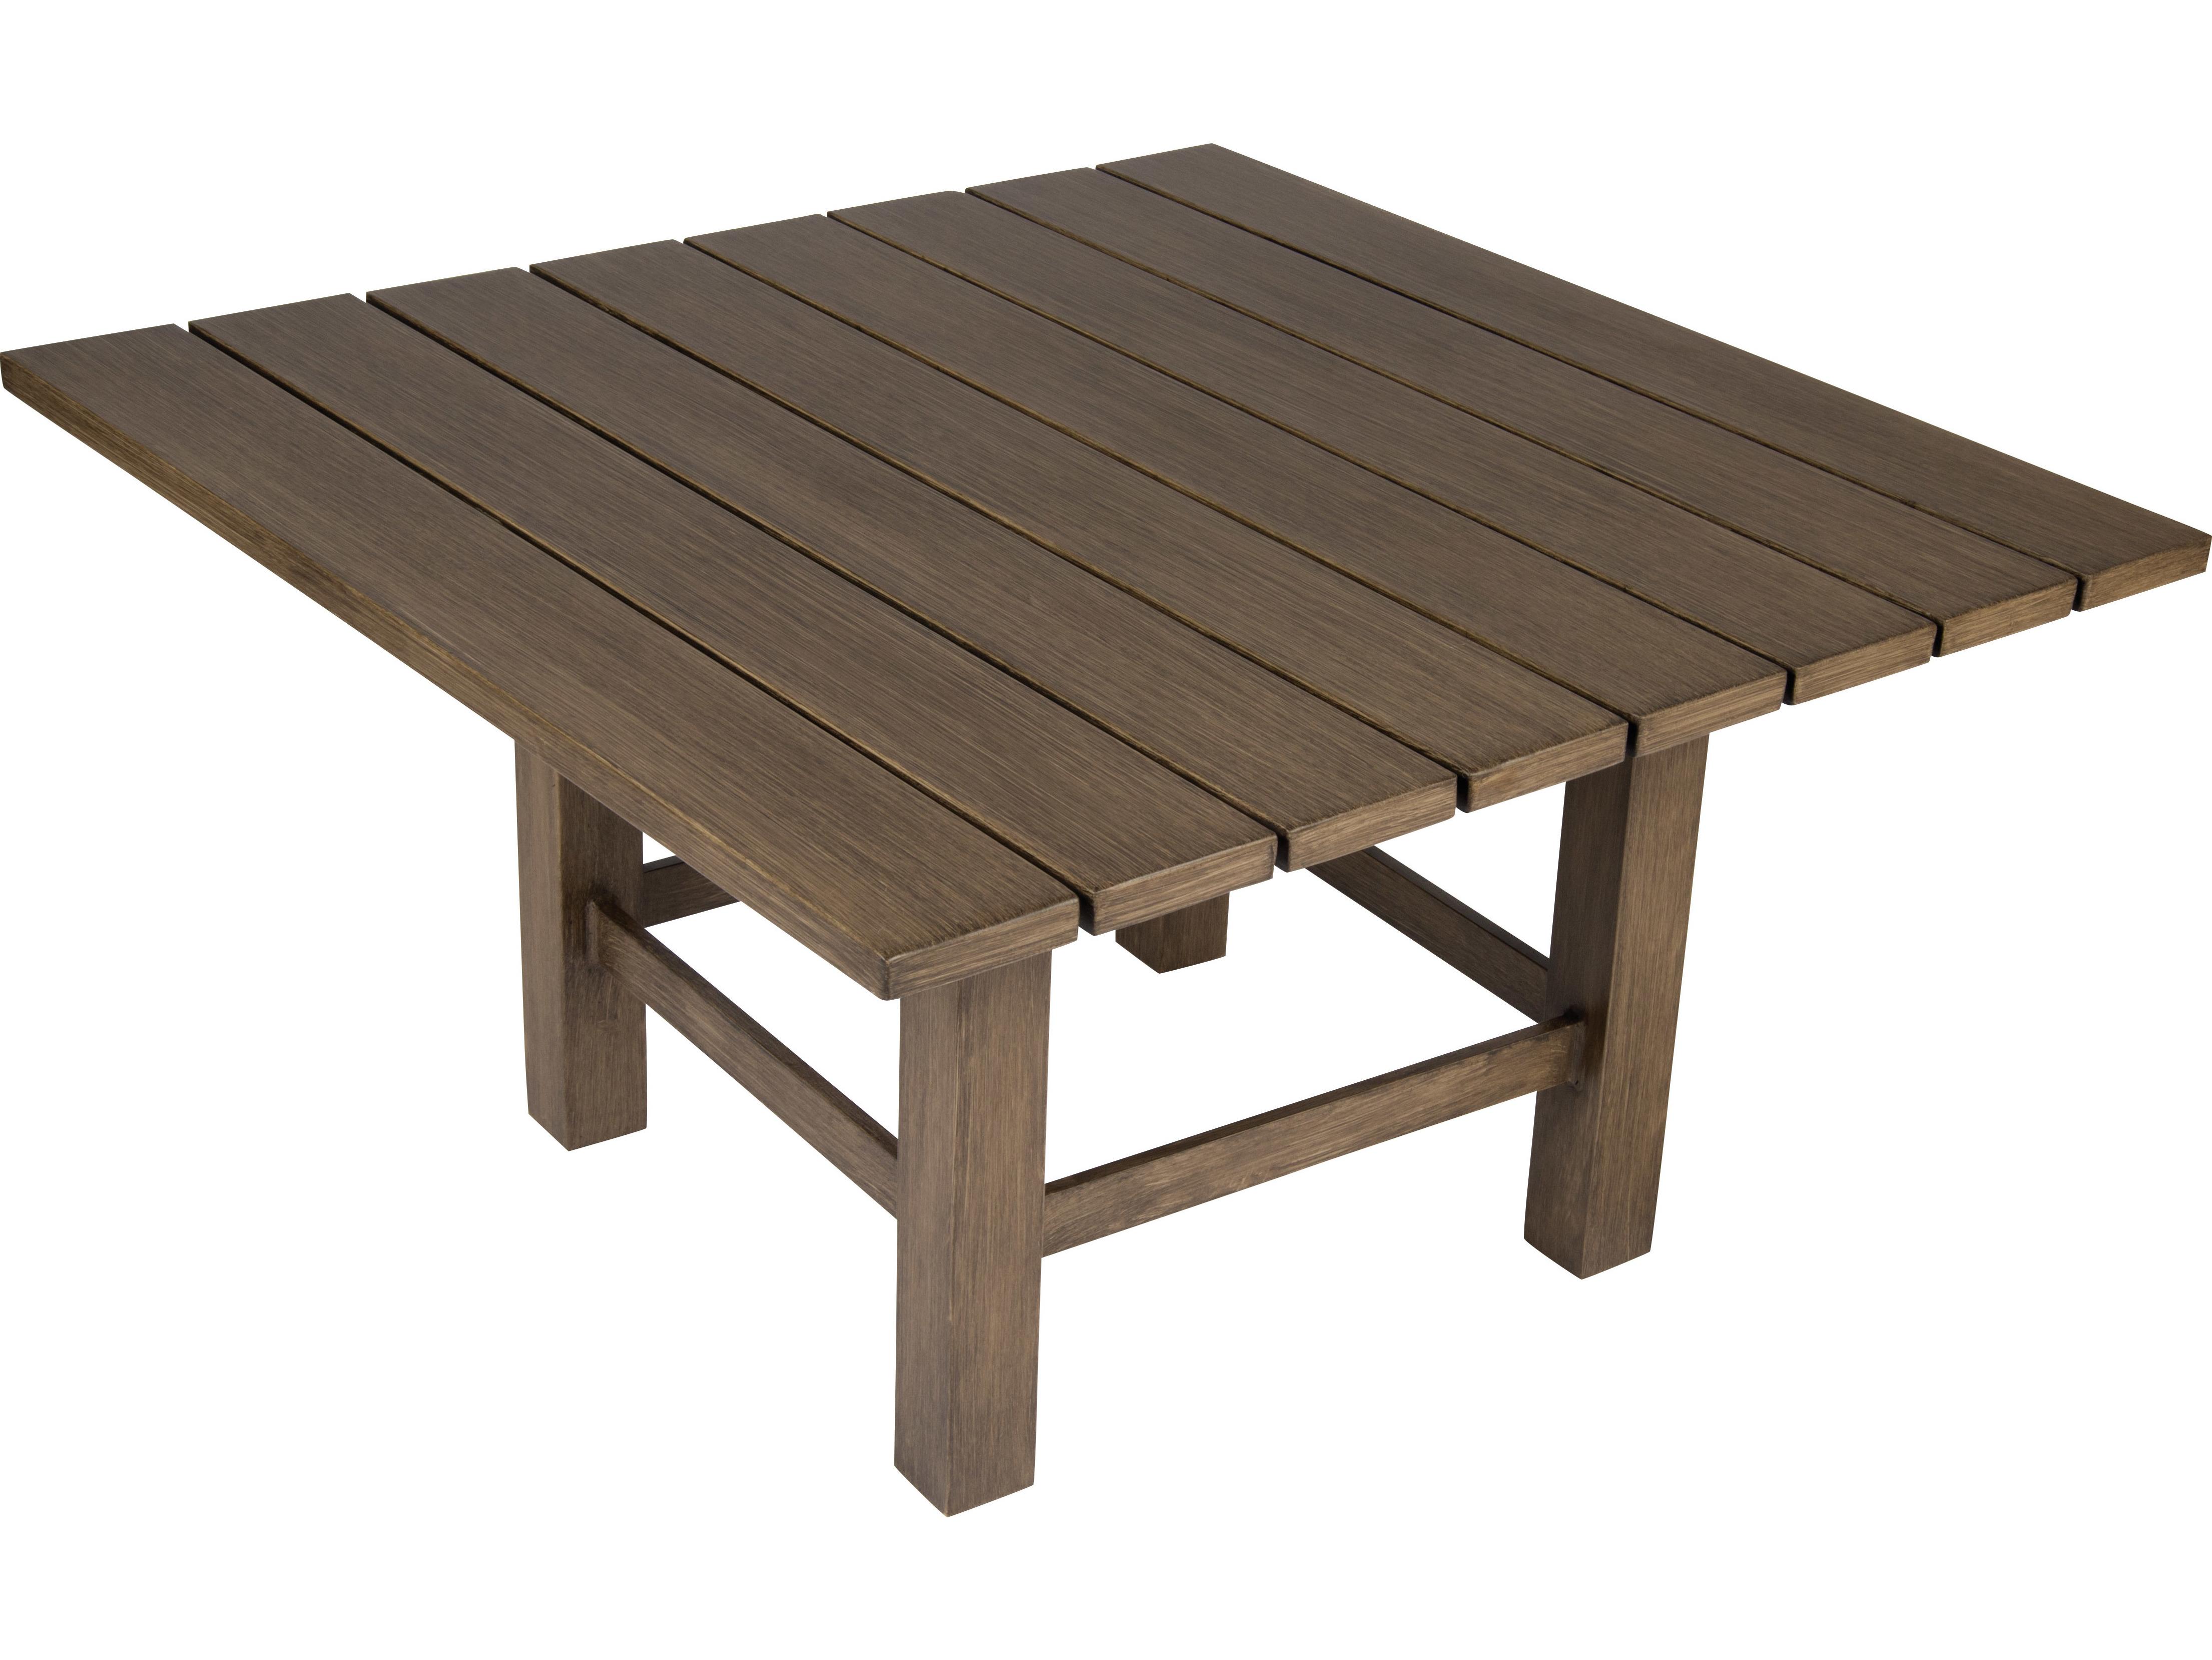 Whitecraft Augusta Aluminum Woodlands 38 Square Coffee Table S592213